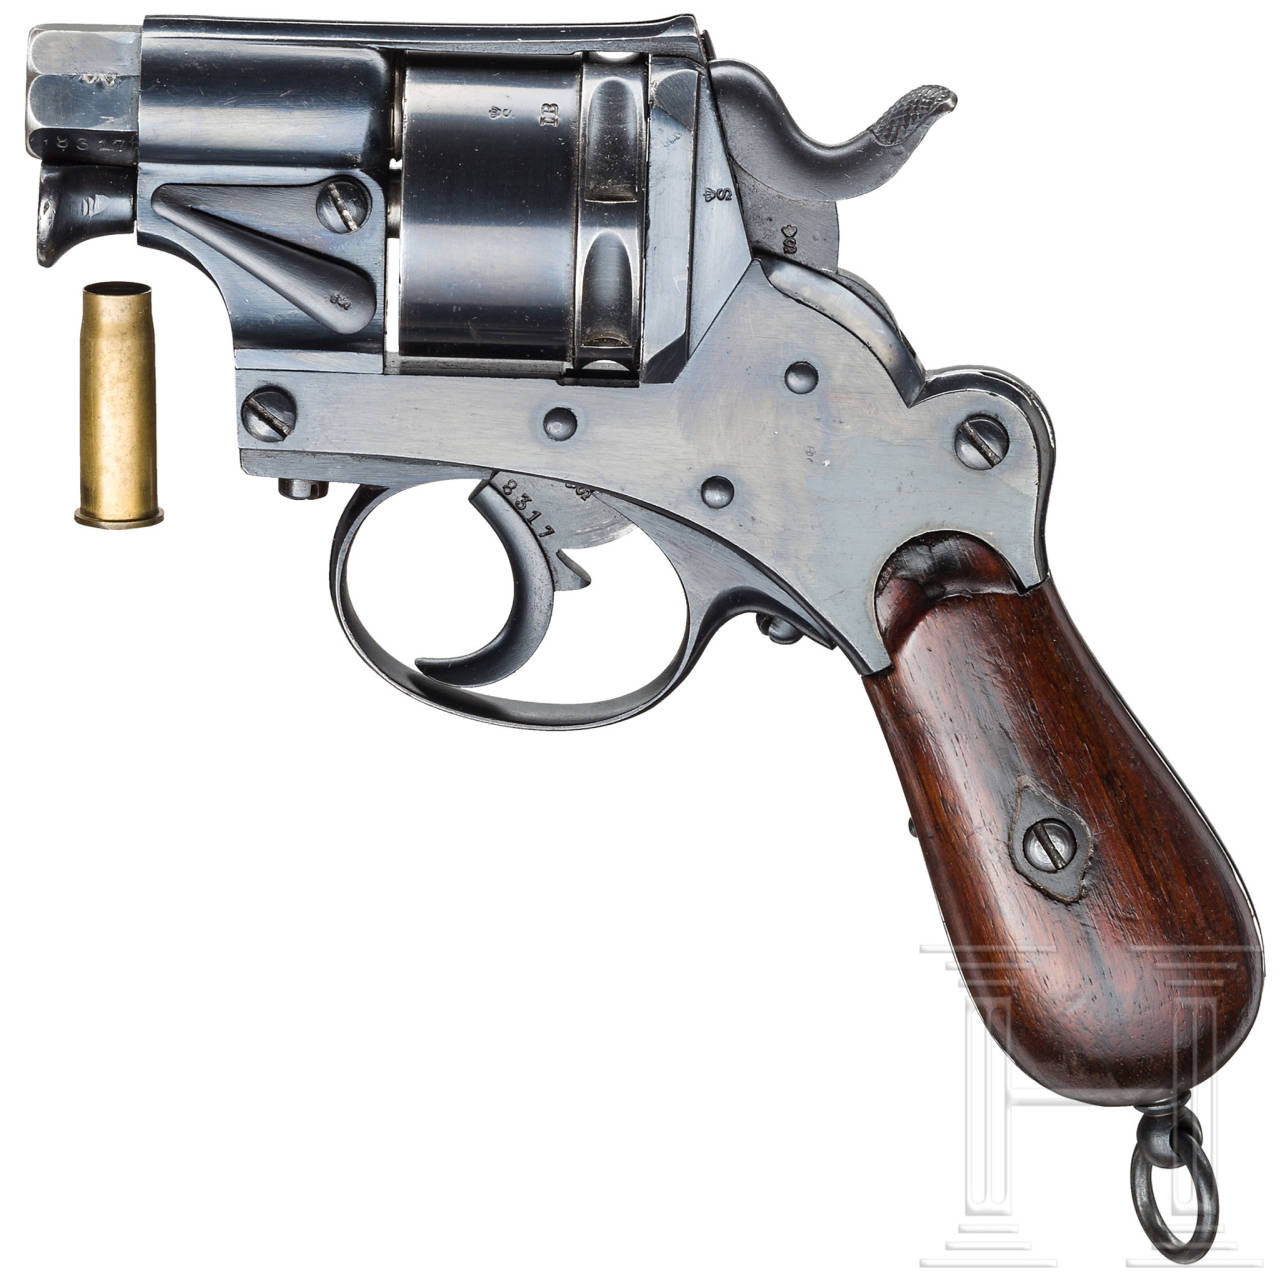 Gaspatronen-Revolver Mod. 1873, J.F.J. Bar Delft